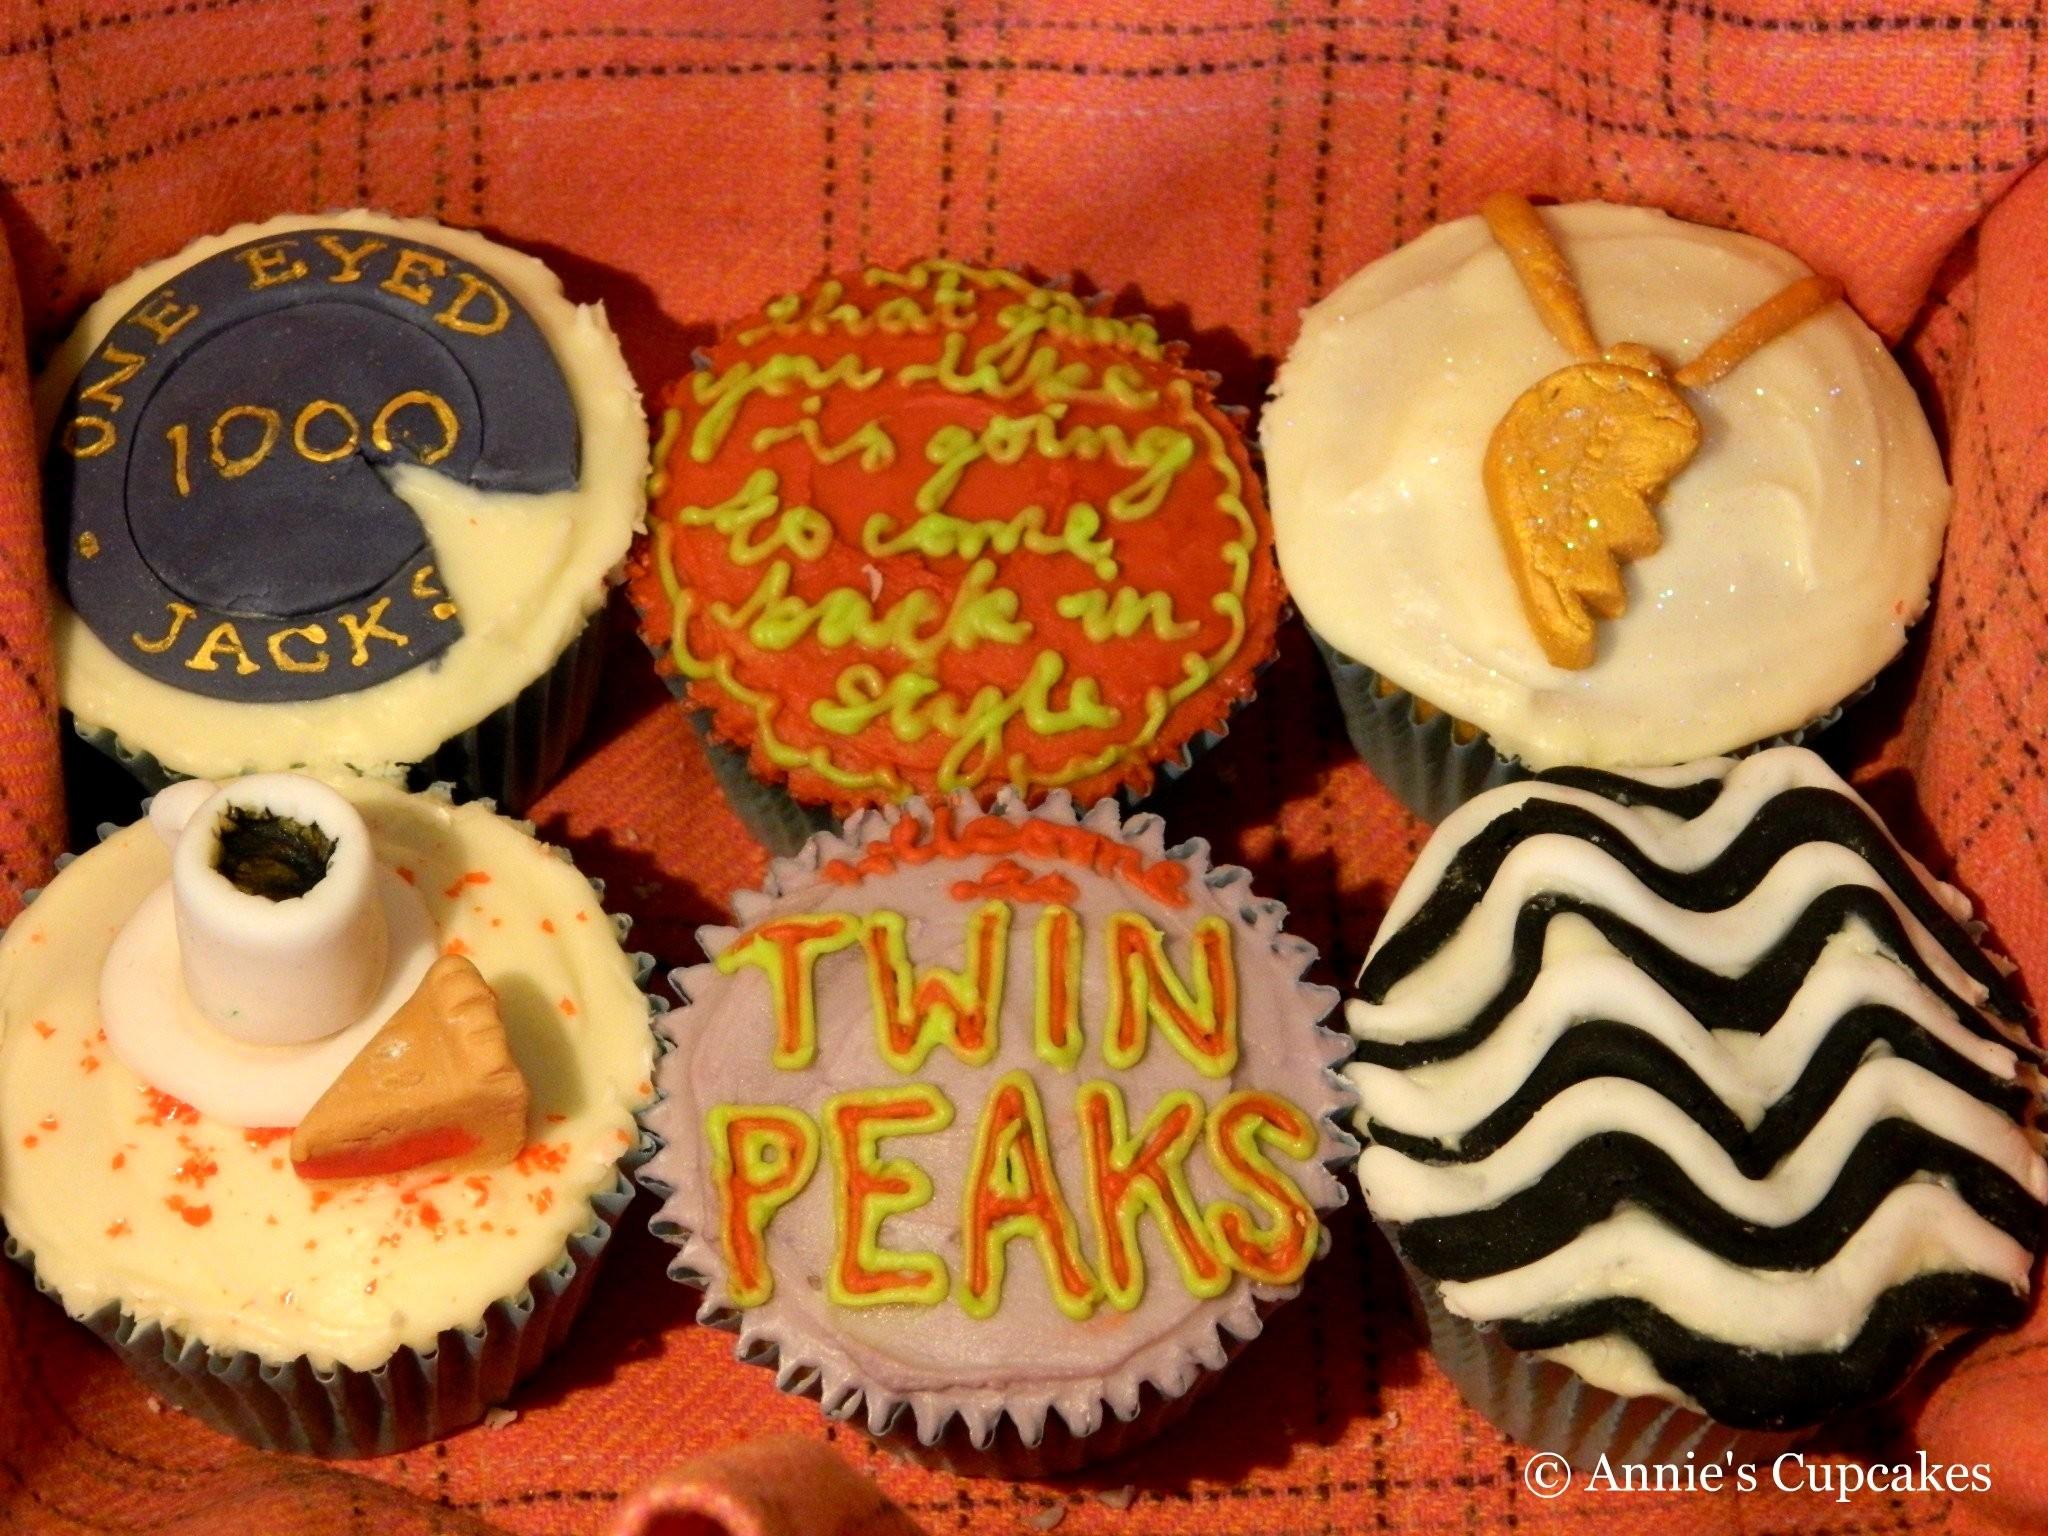 Annie's Cupcakes: Twin Peaks Cupcakes